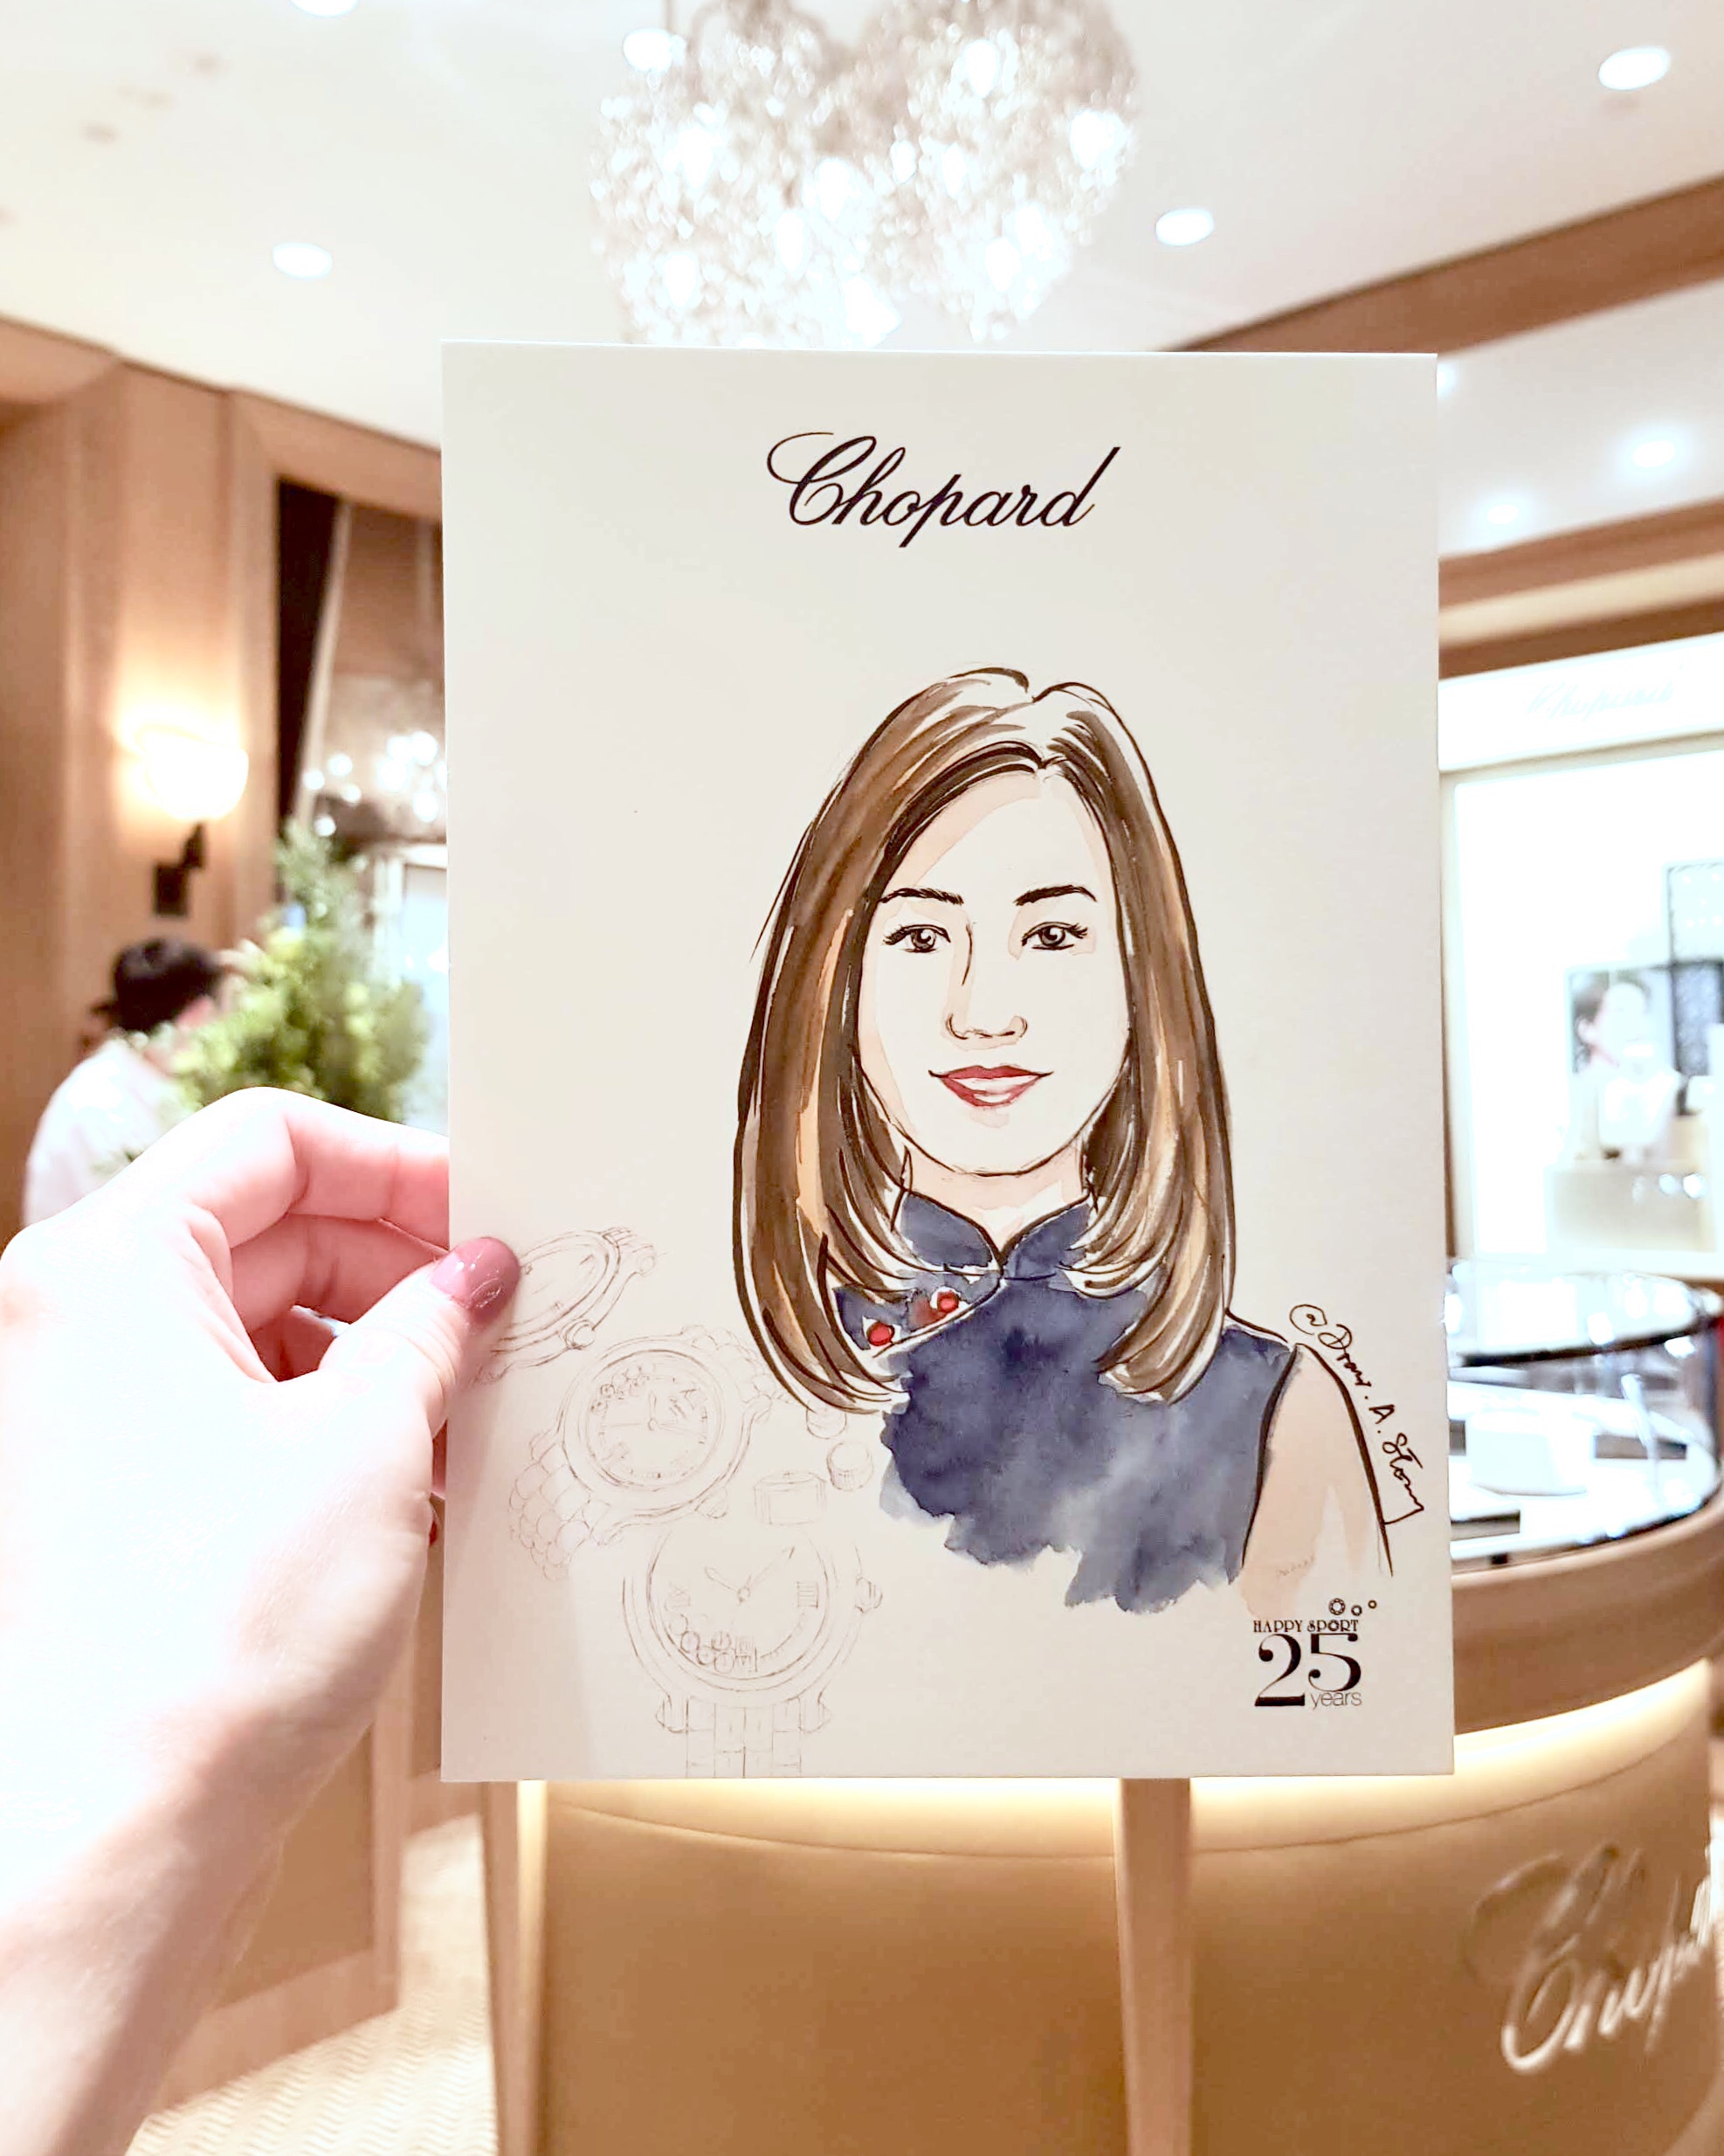 Live Fashion Portrait for Chopard's Private Event